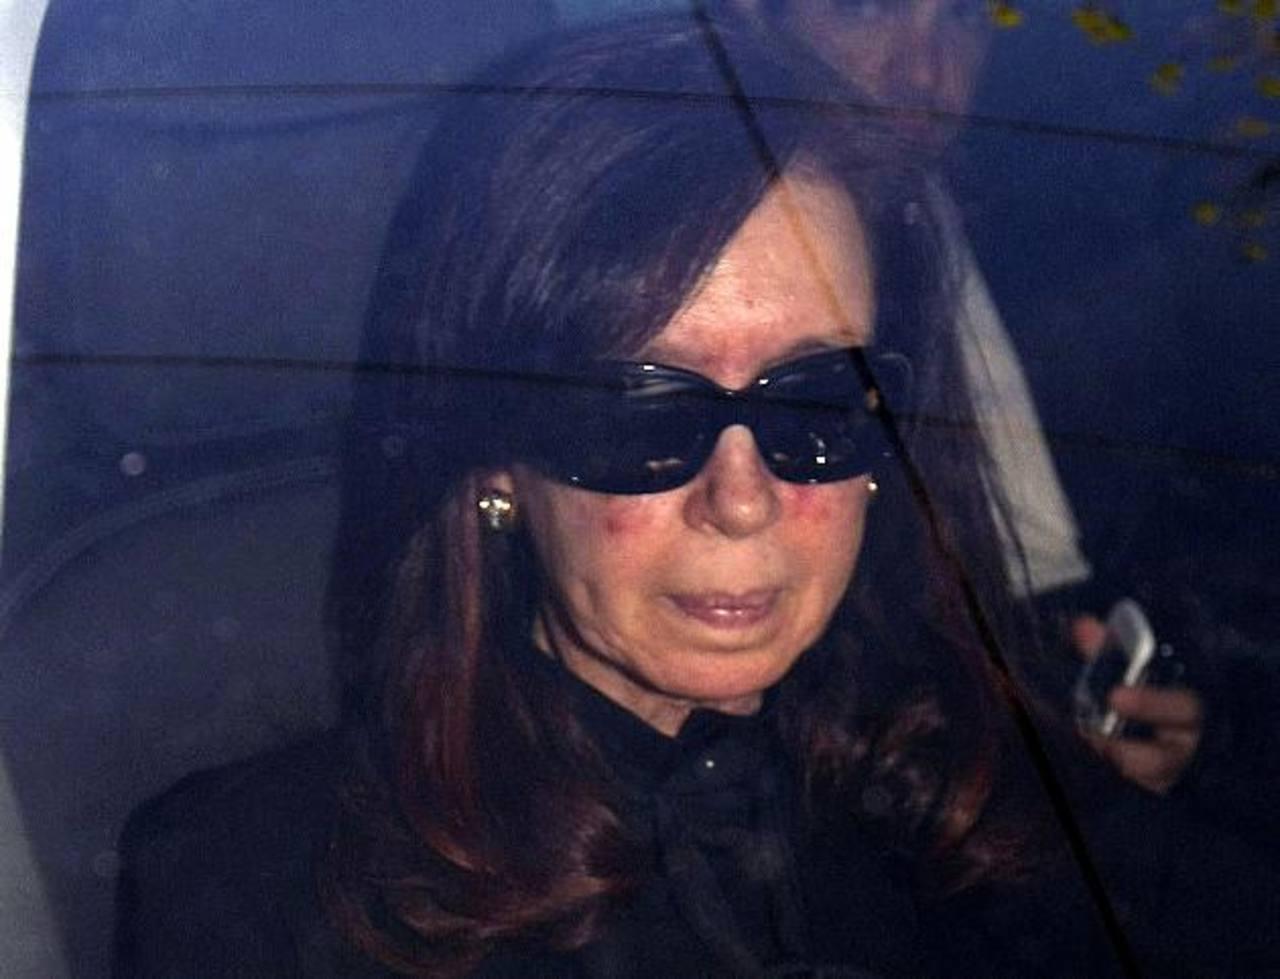 La gobernante argentina, Cristina Fernández, a su llegada a la clínica Favaloro de Buenos Aires. foto edh / reuters